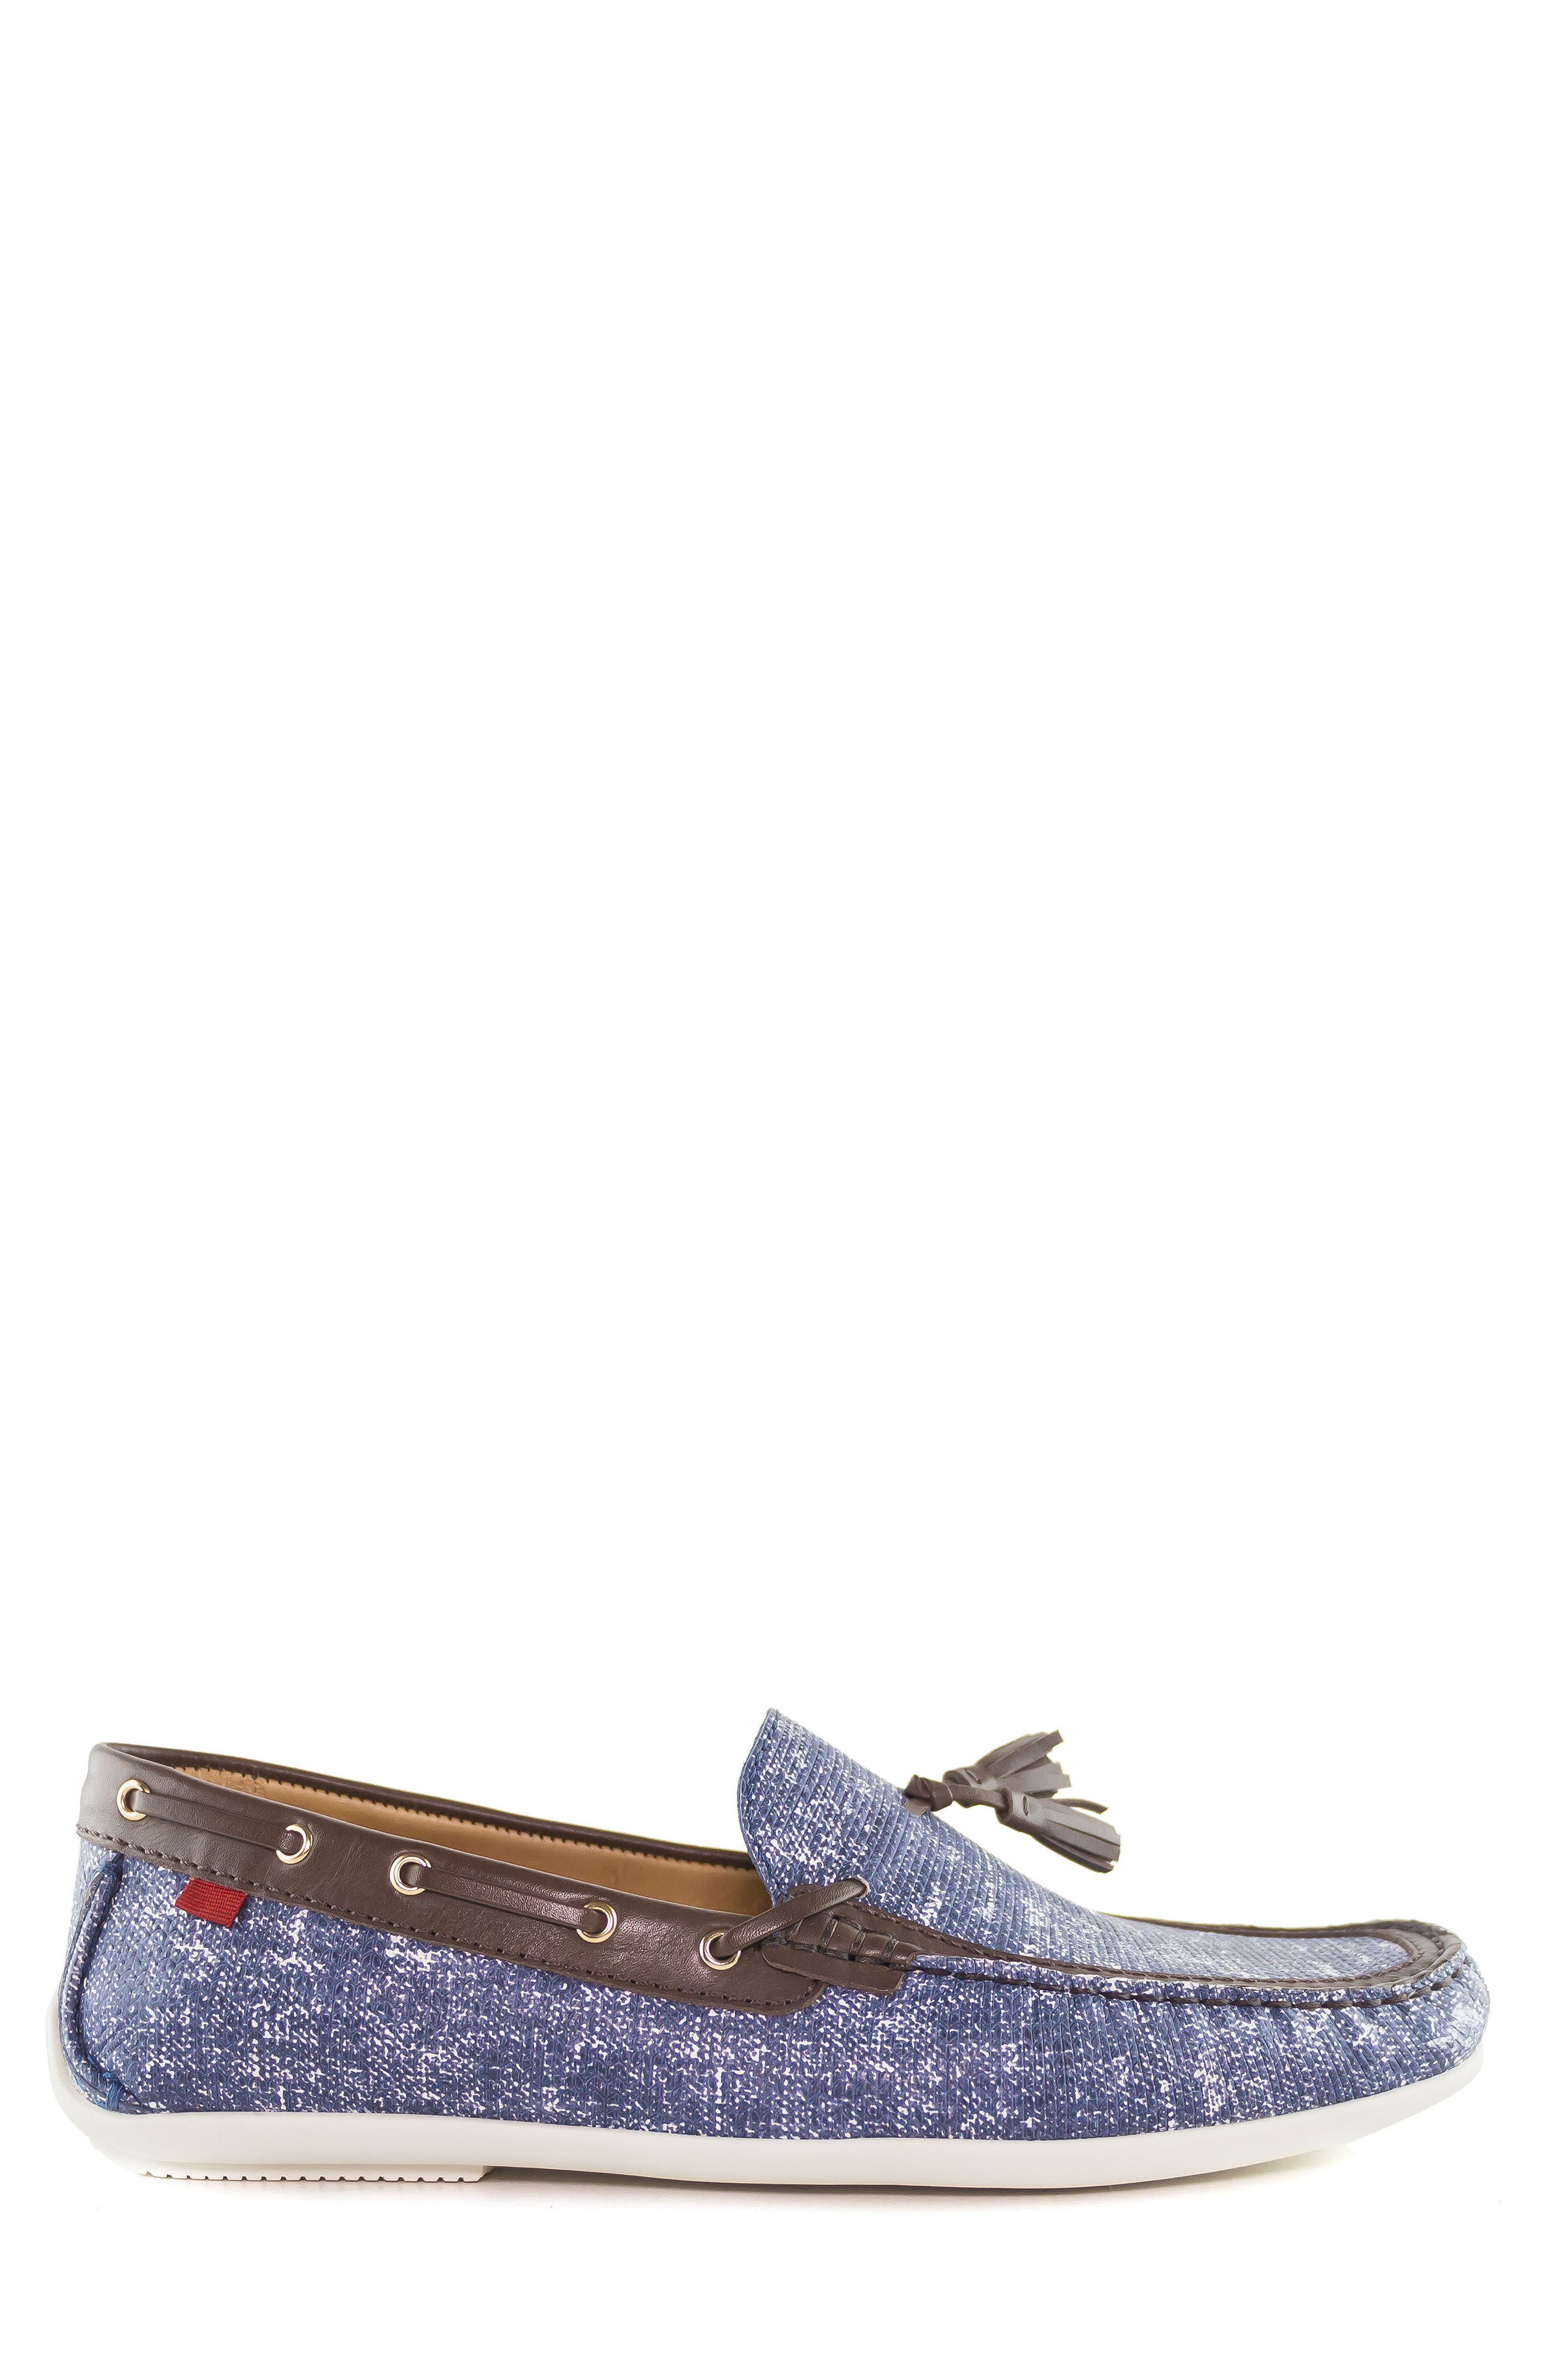 Bushwick Tasseled Driving Loafer,                             Alternate thumbnail 3, color,                             Jeans Blue